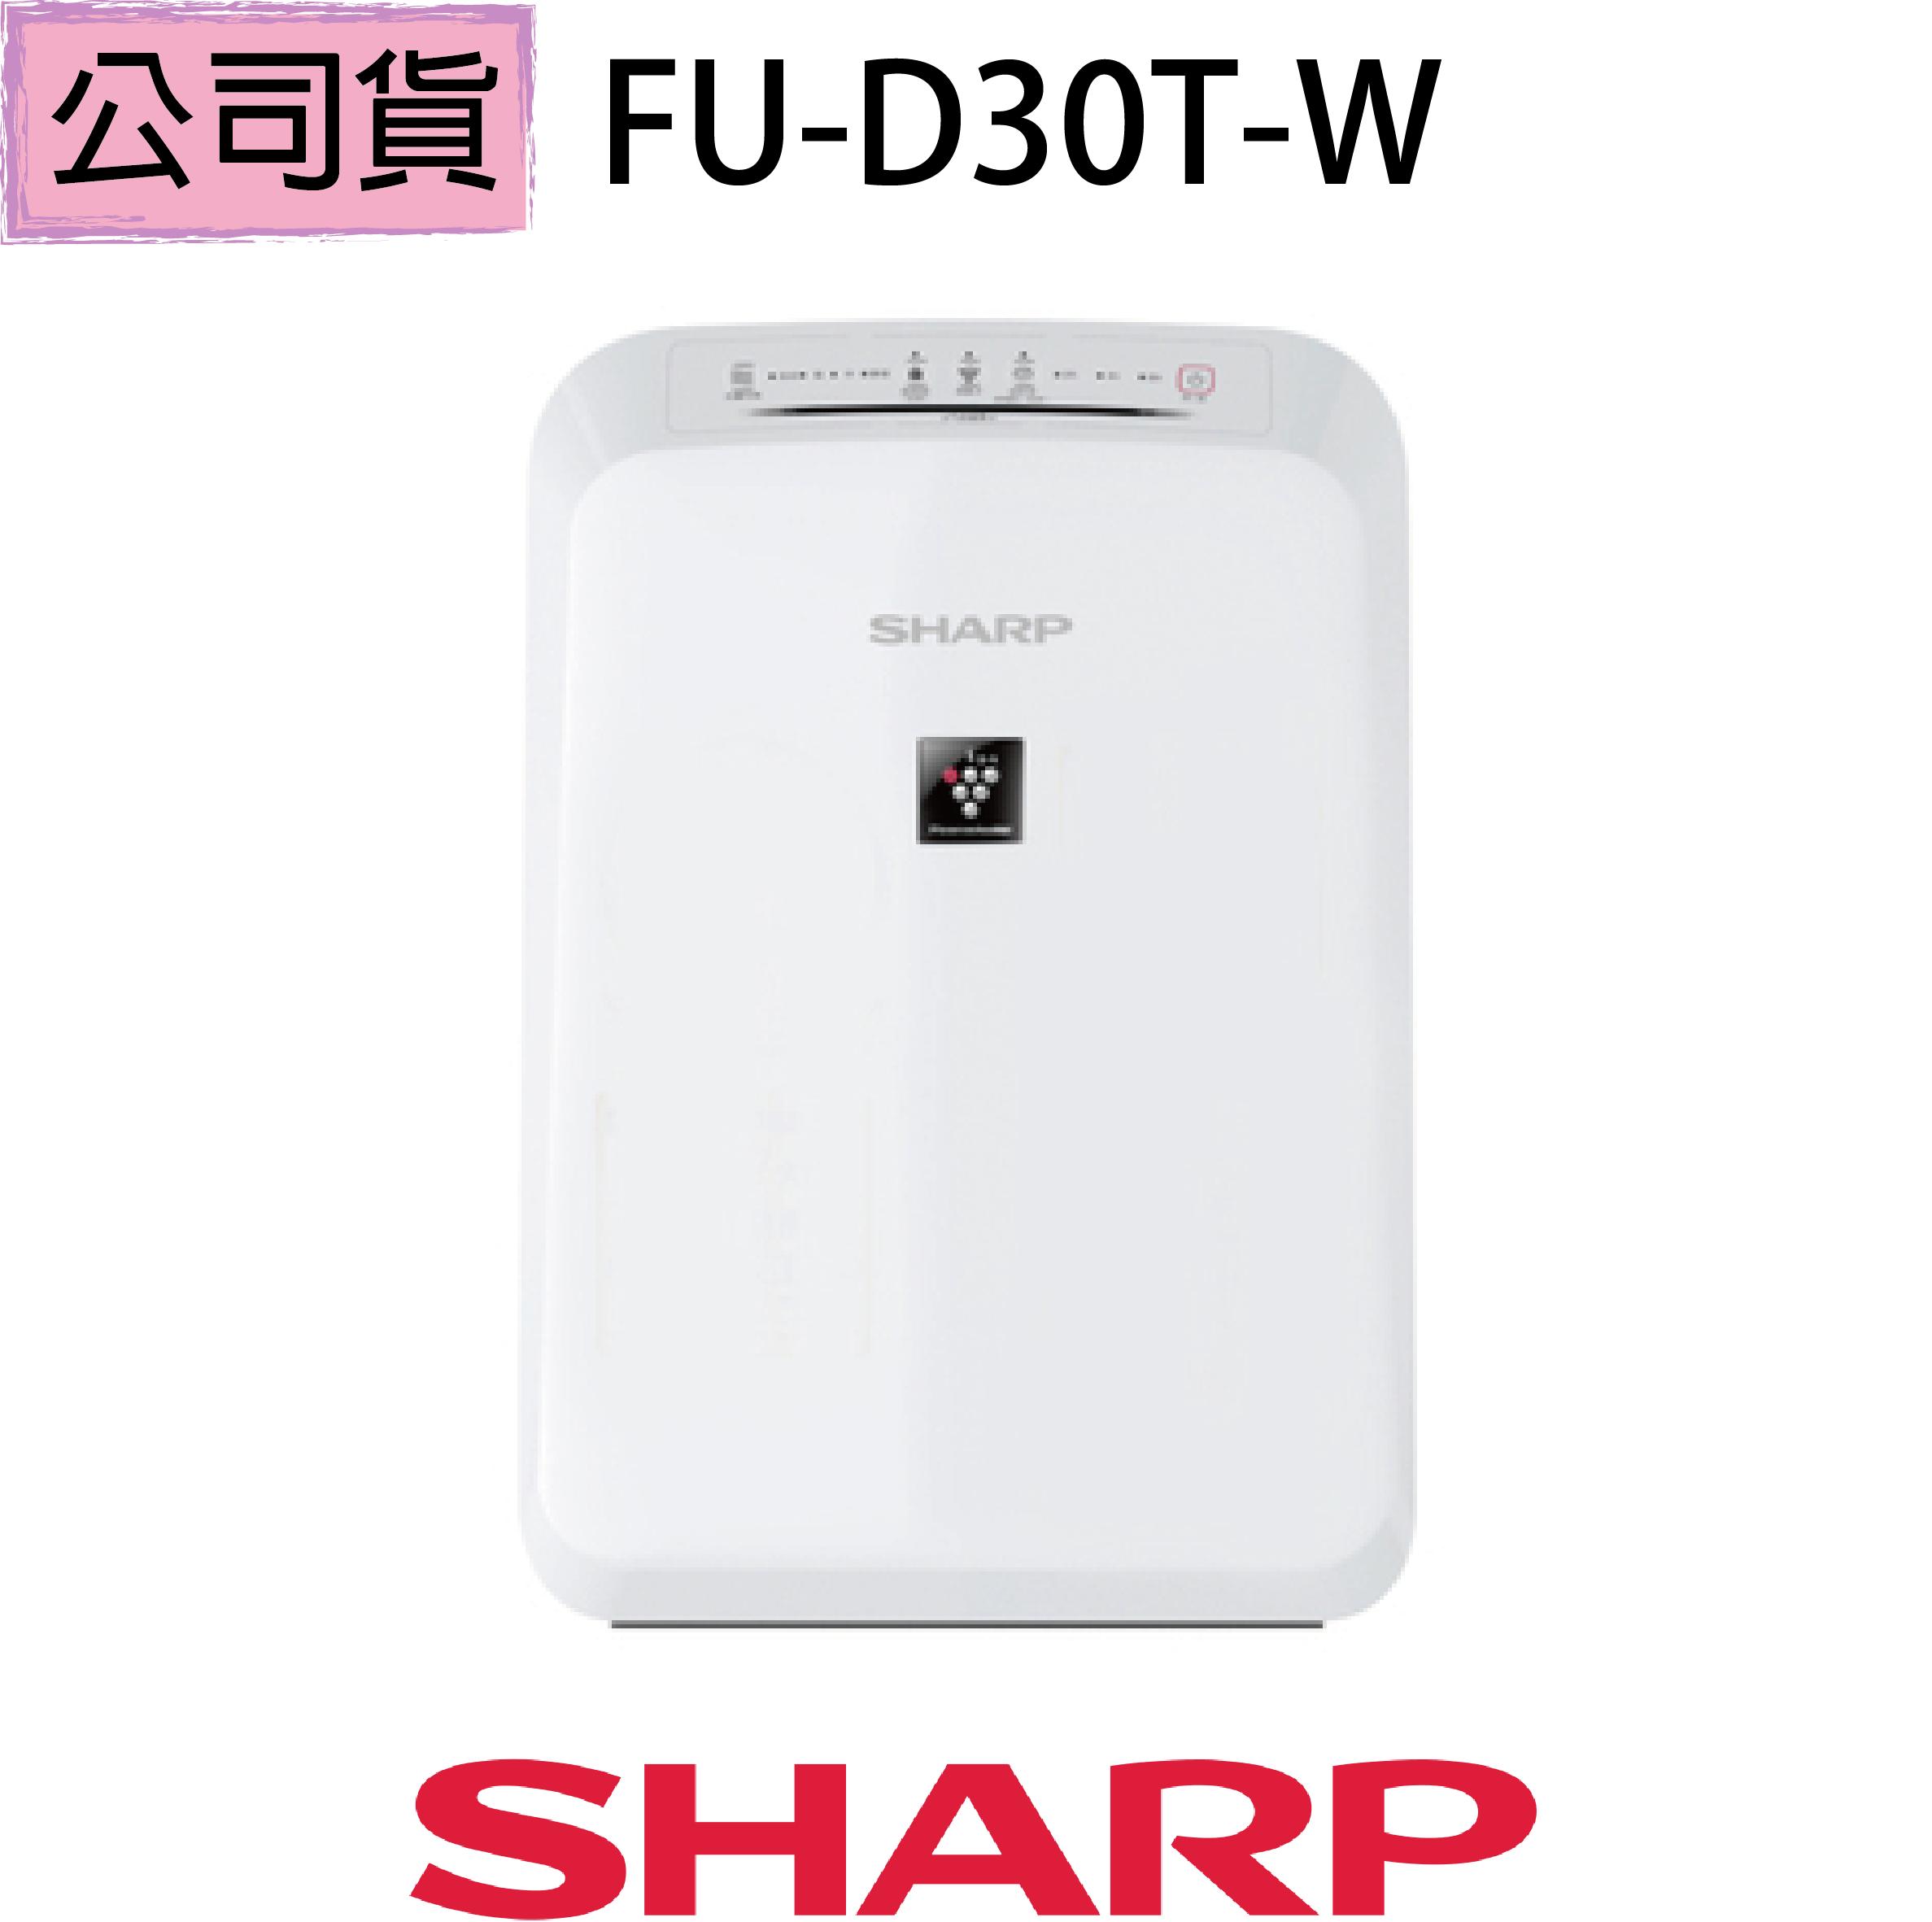 【SHARP】夏寶 自動除菌離子 空氣清淨機FU-D30T-W(公司貨)